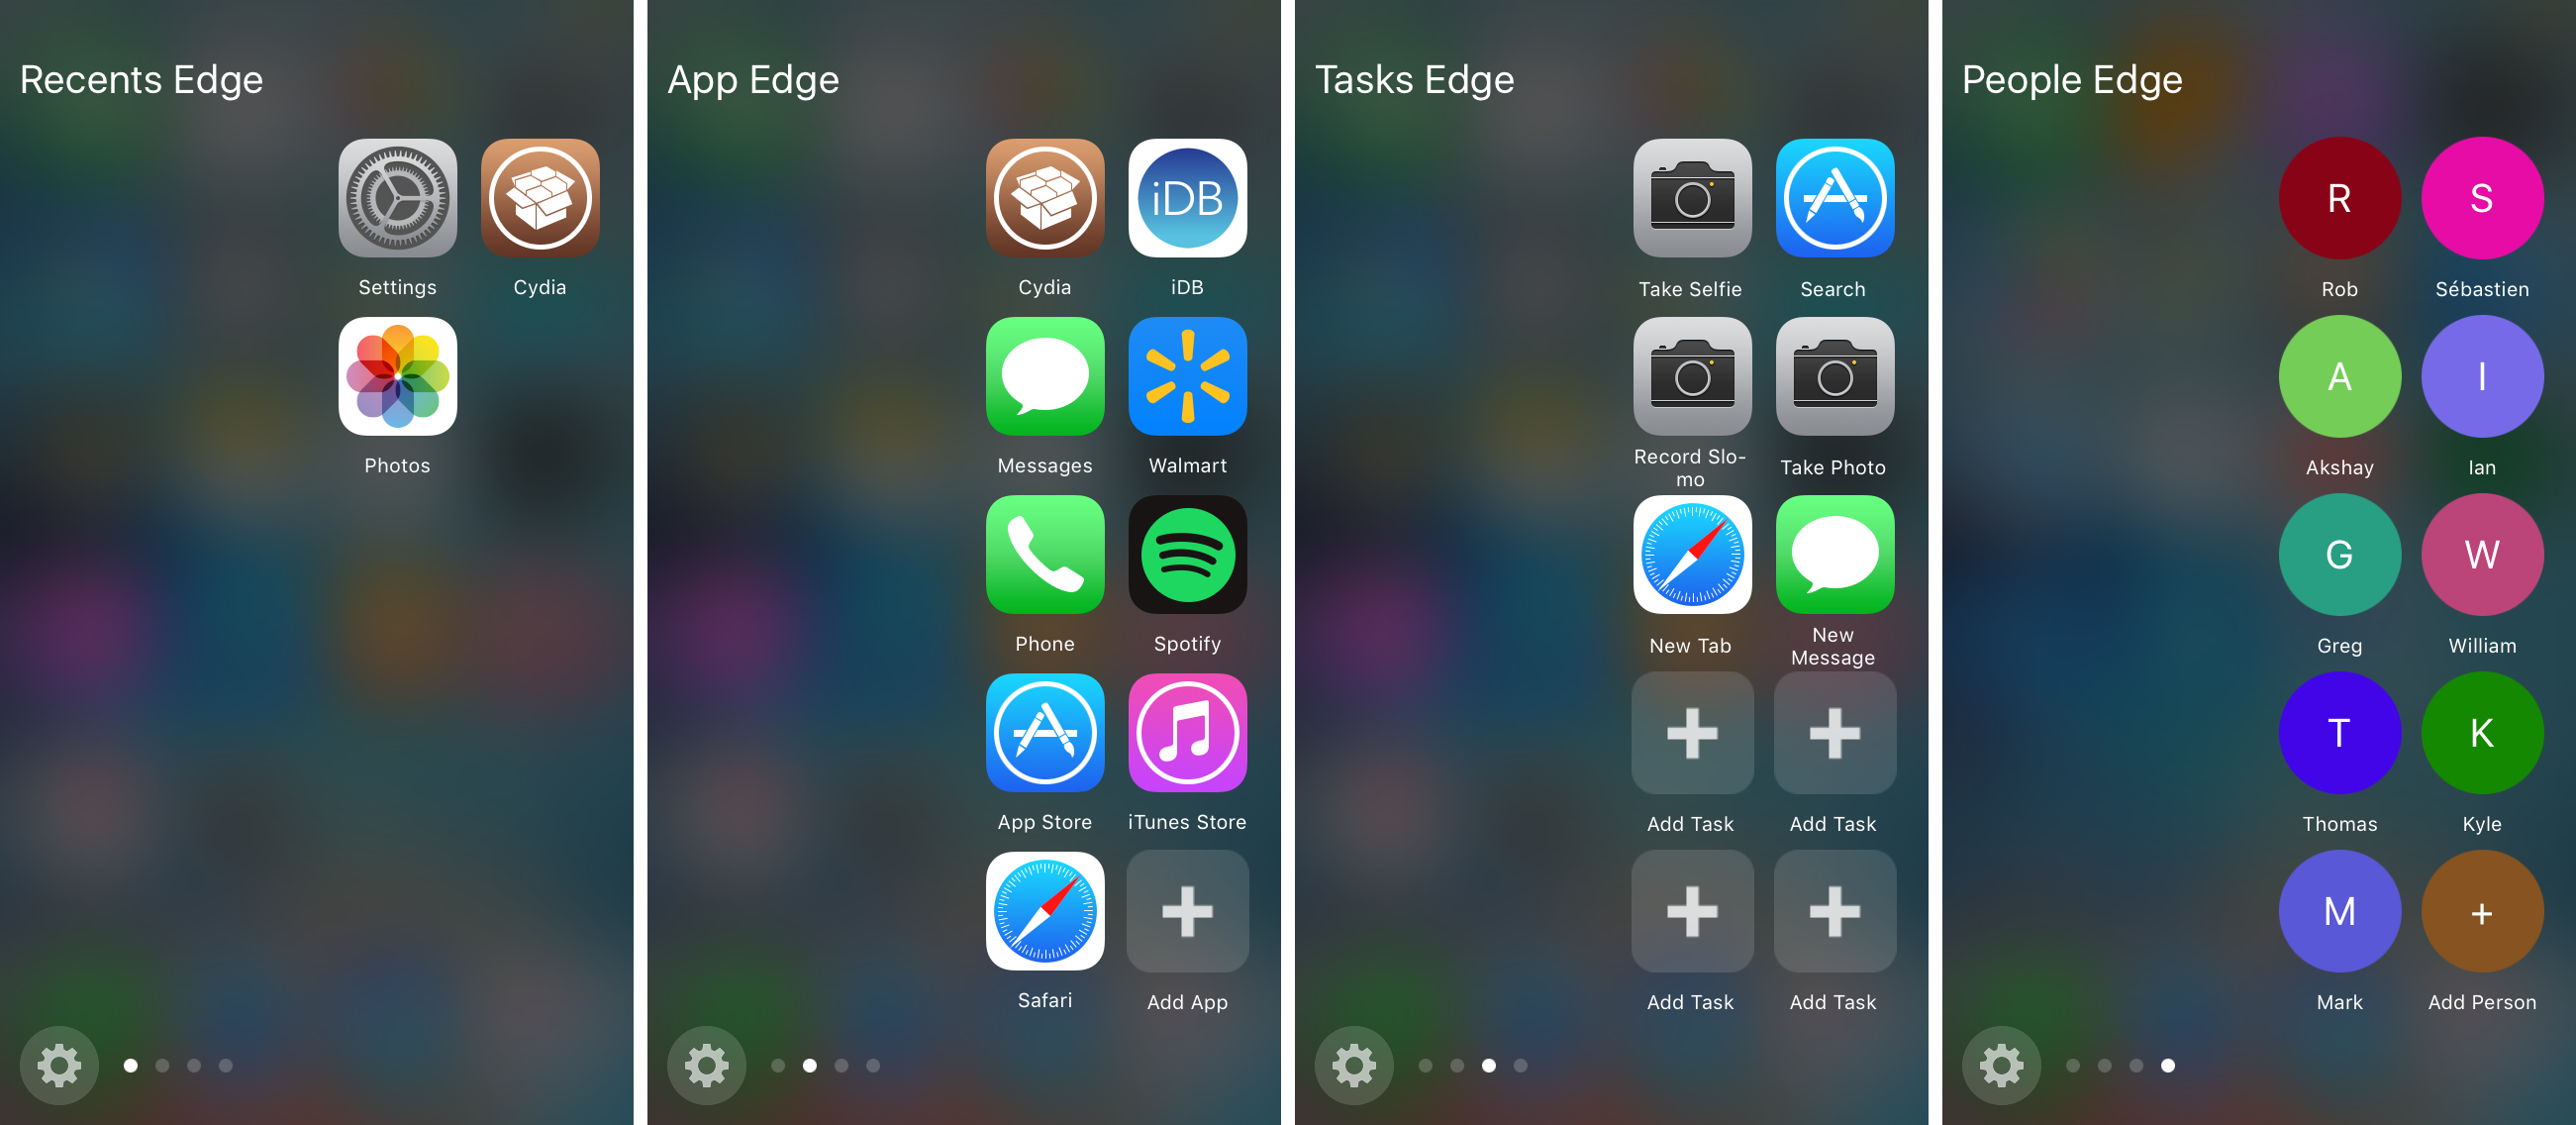 Edge All Interface